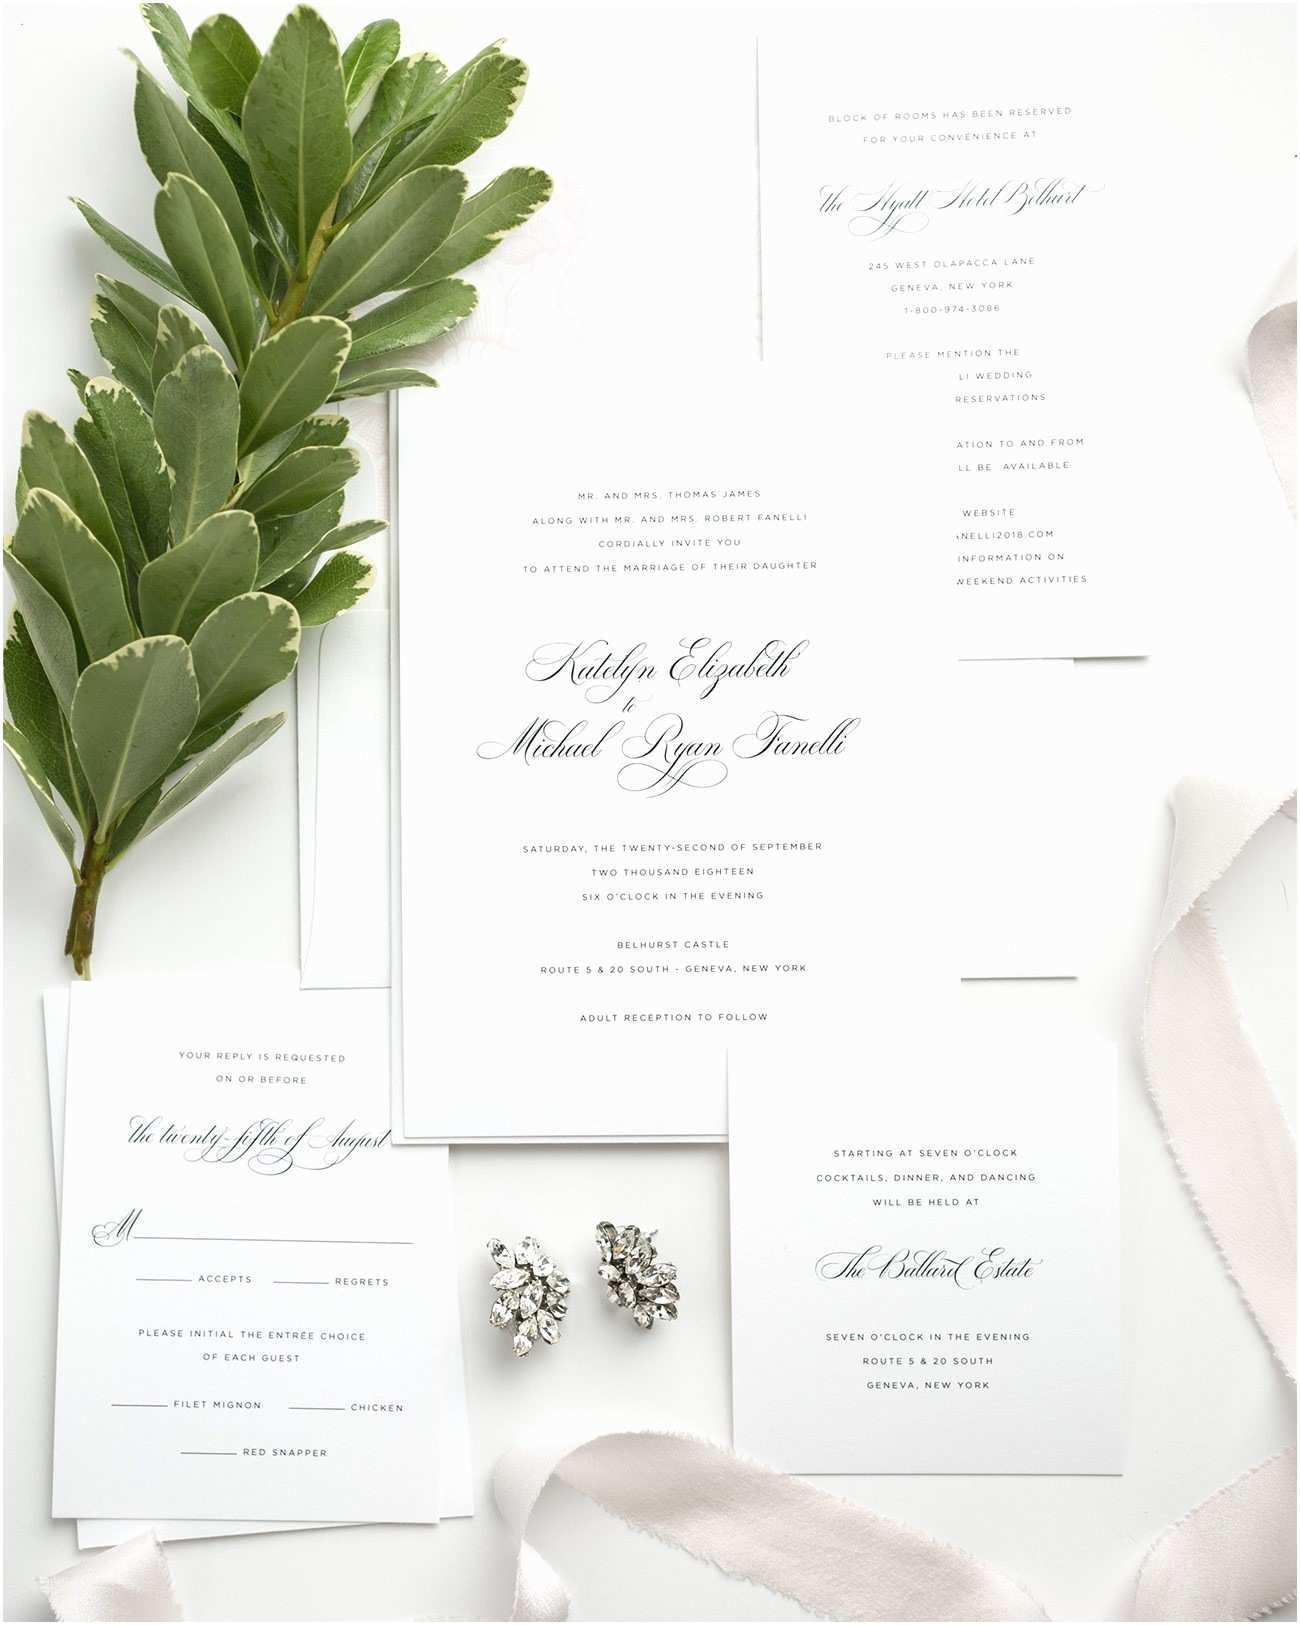 Filipino Wedding Invitation Sample Refrence Sample Wedding Invitation In the Philippines